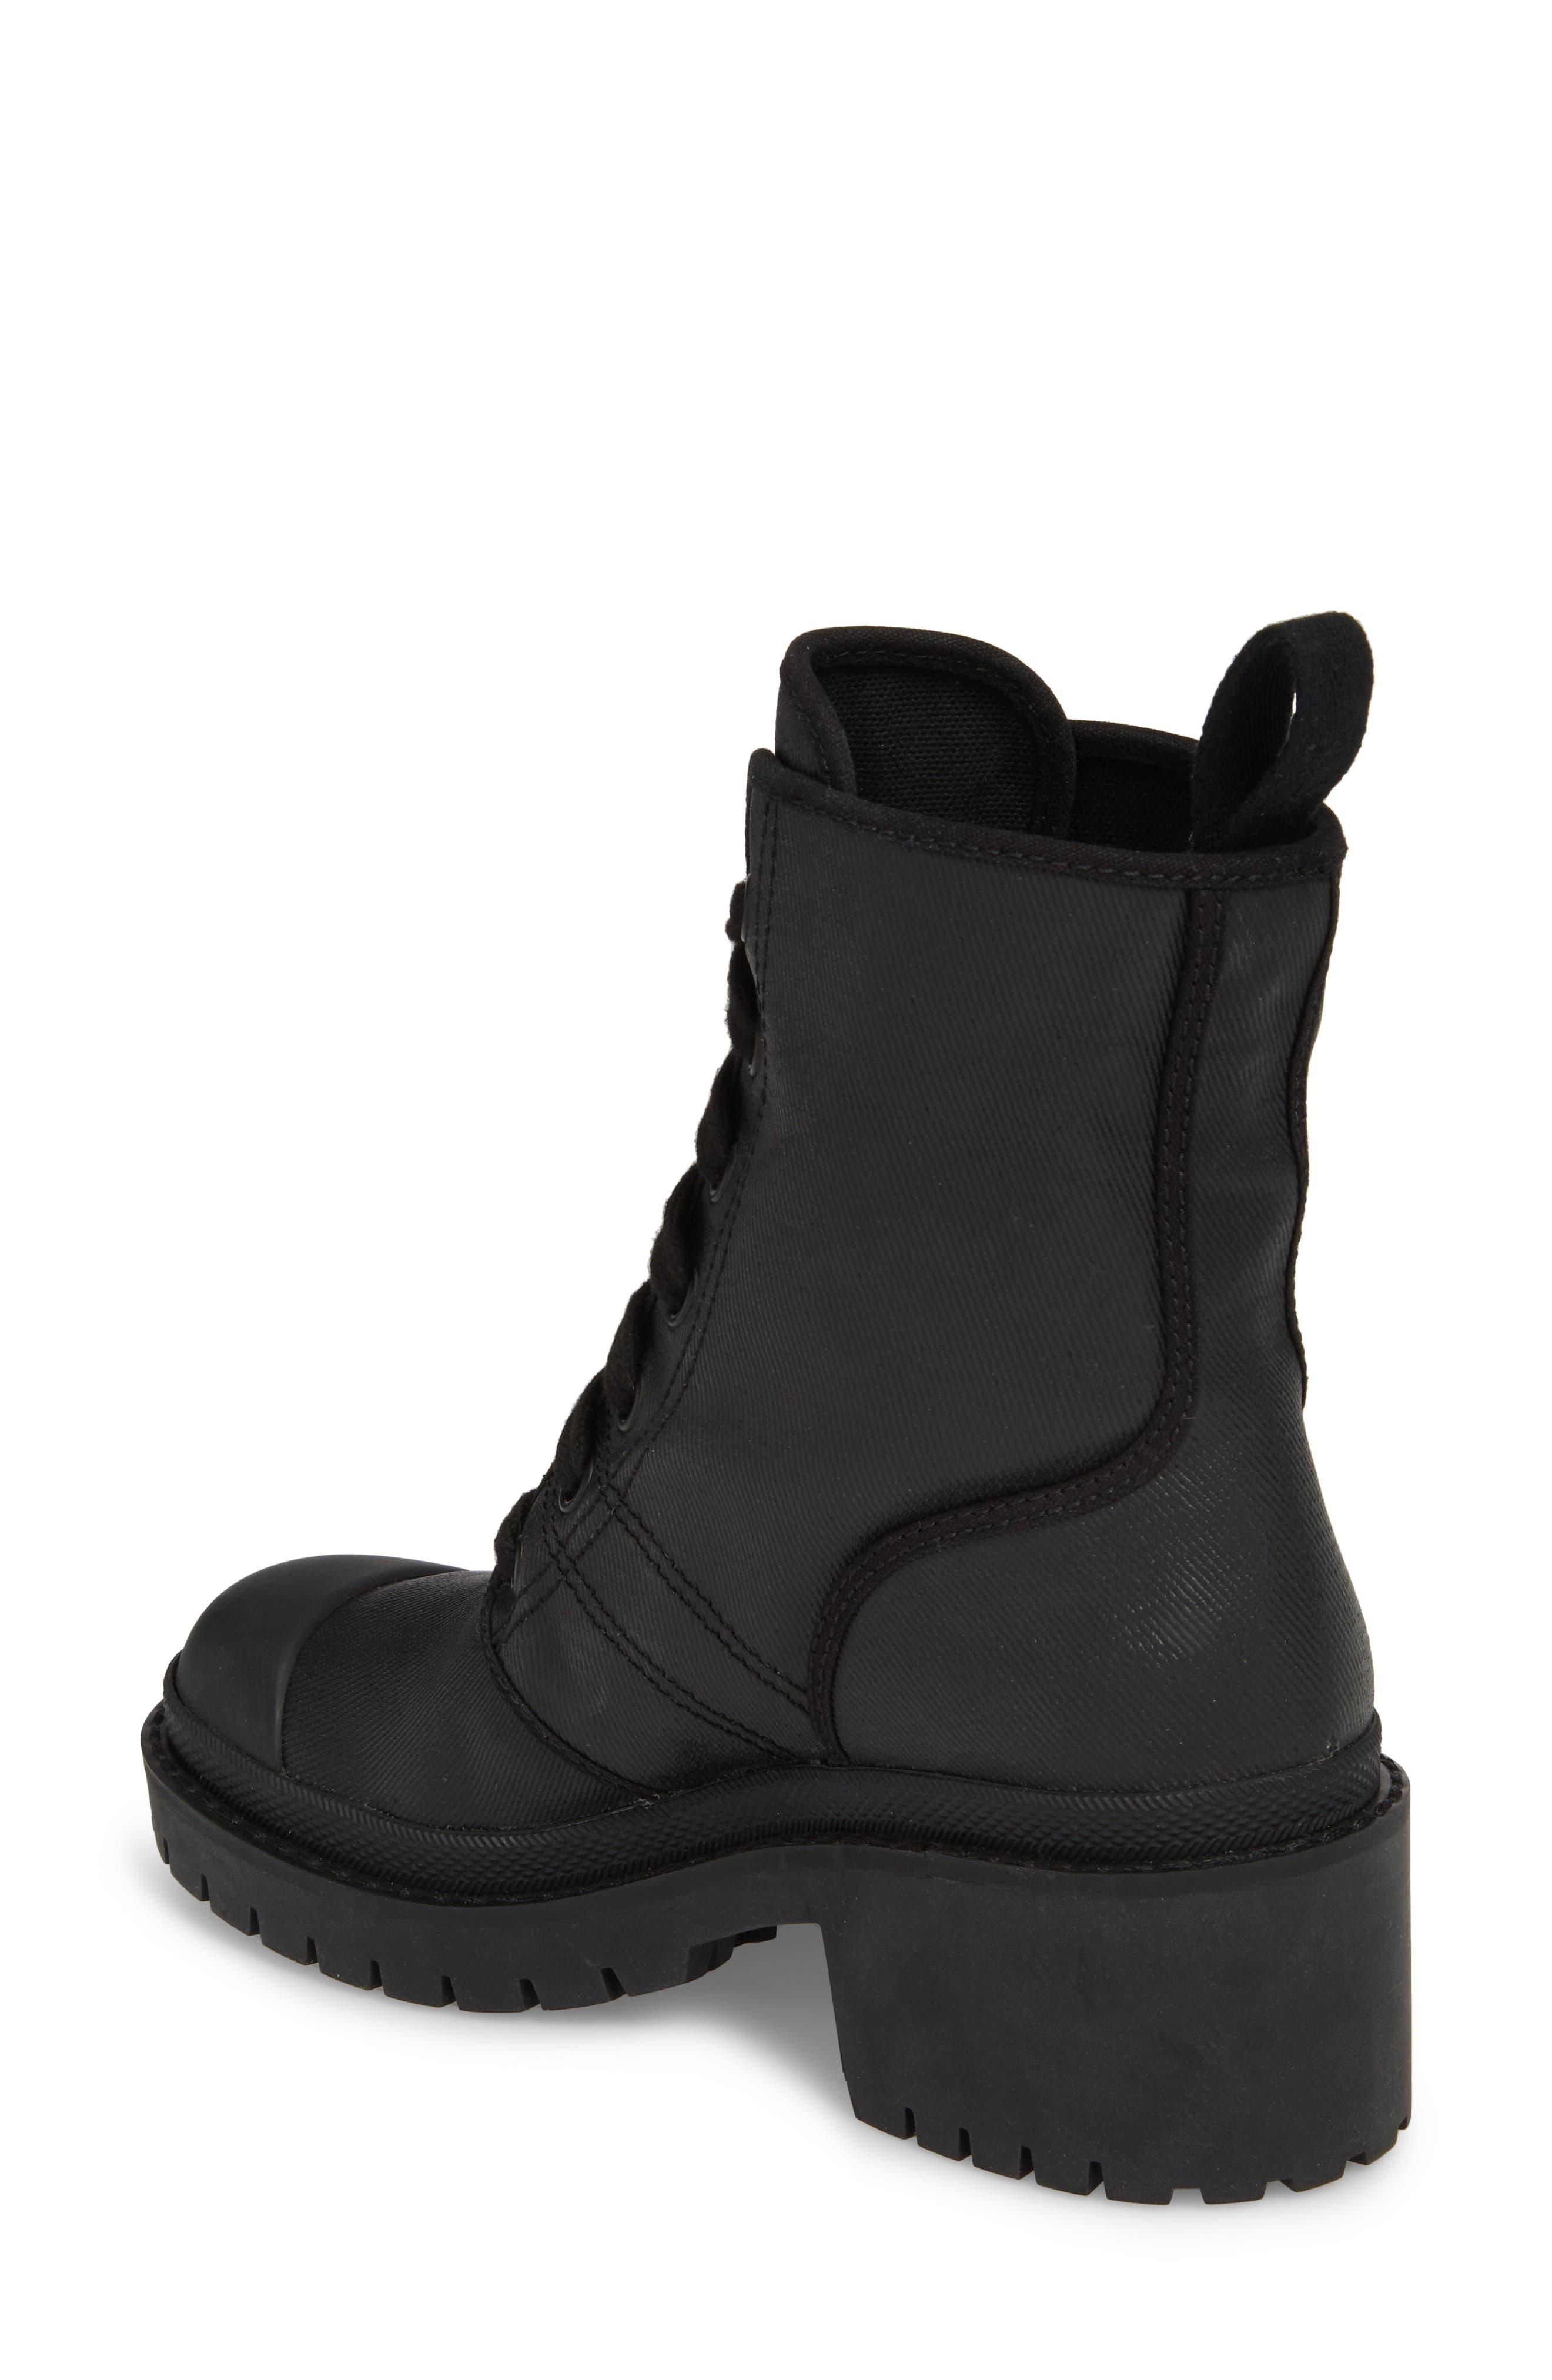 Bristol Lace-Up Boot,                             Alternate thumbnail 2, color,                             001